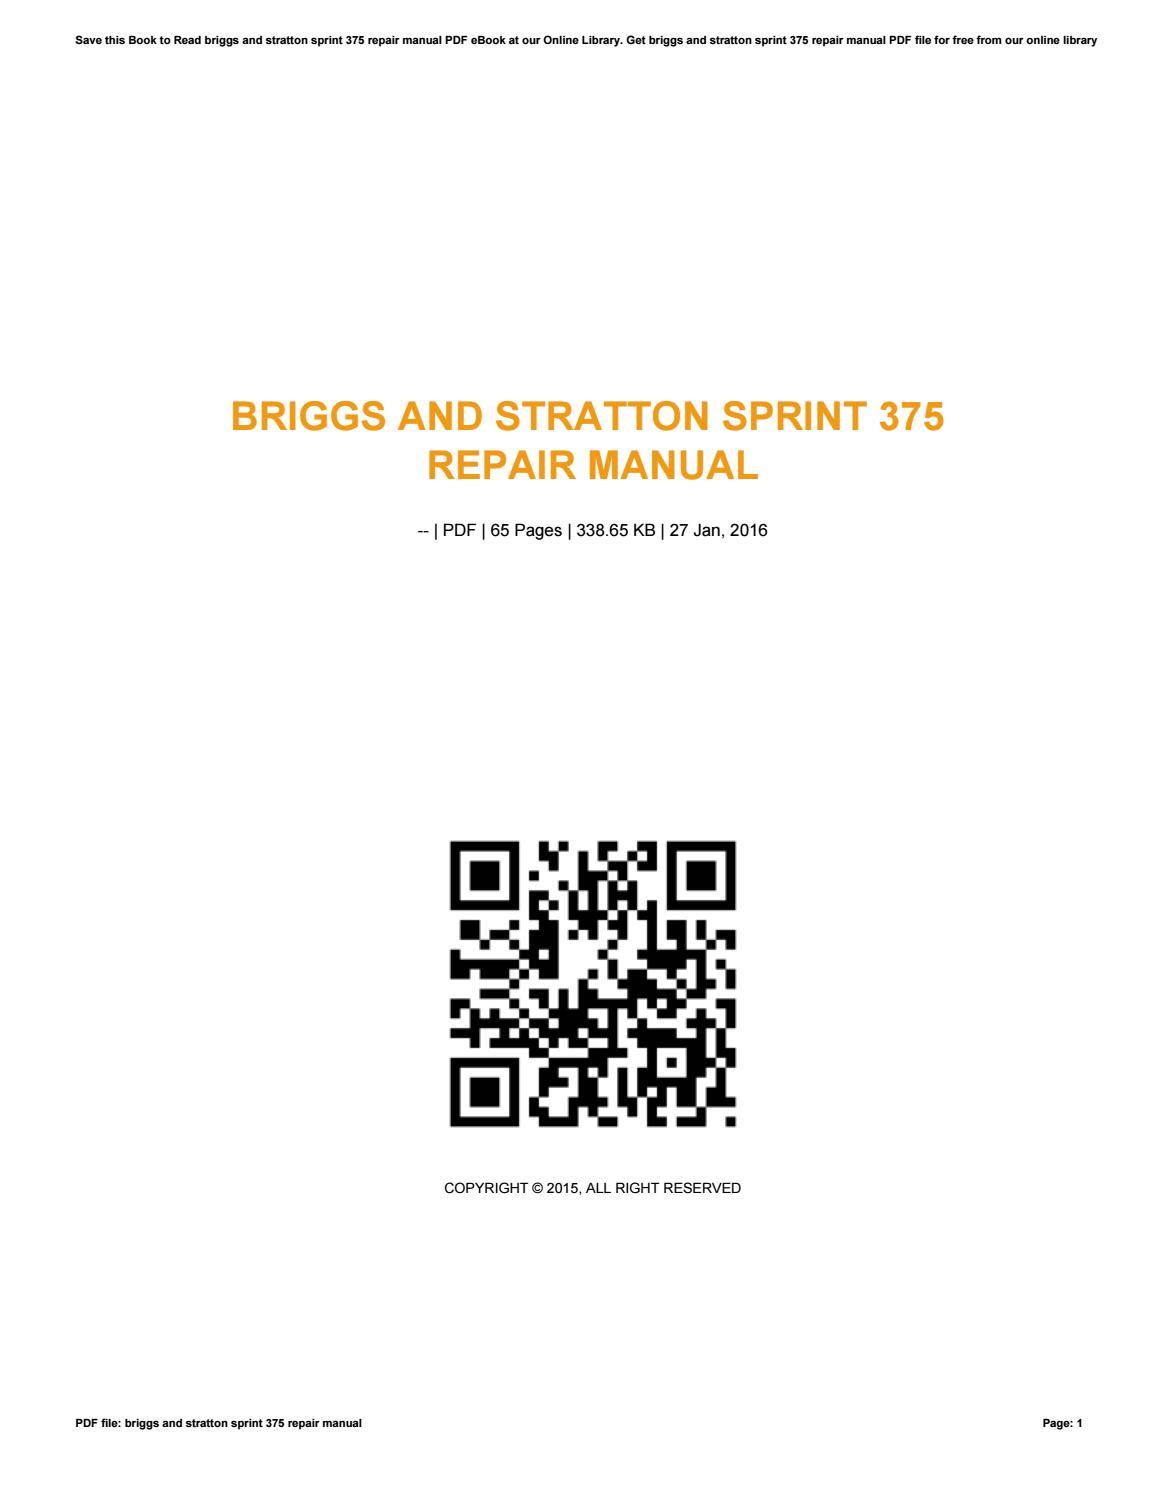 Briggs and stratton sprint 375 repair manual by malove170